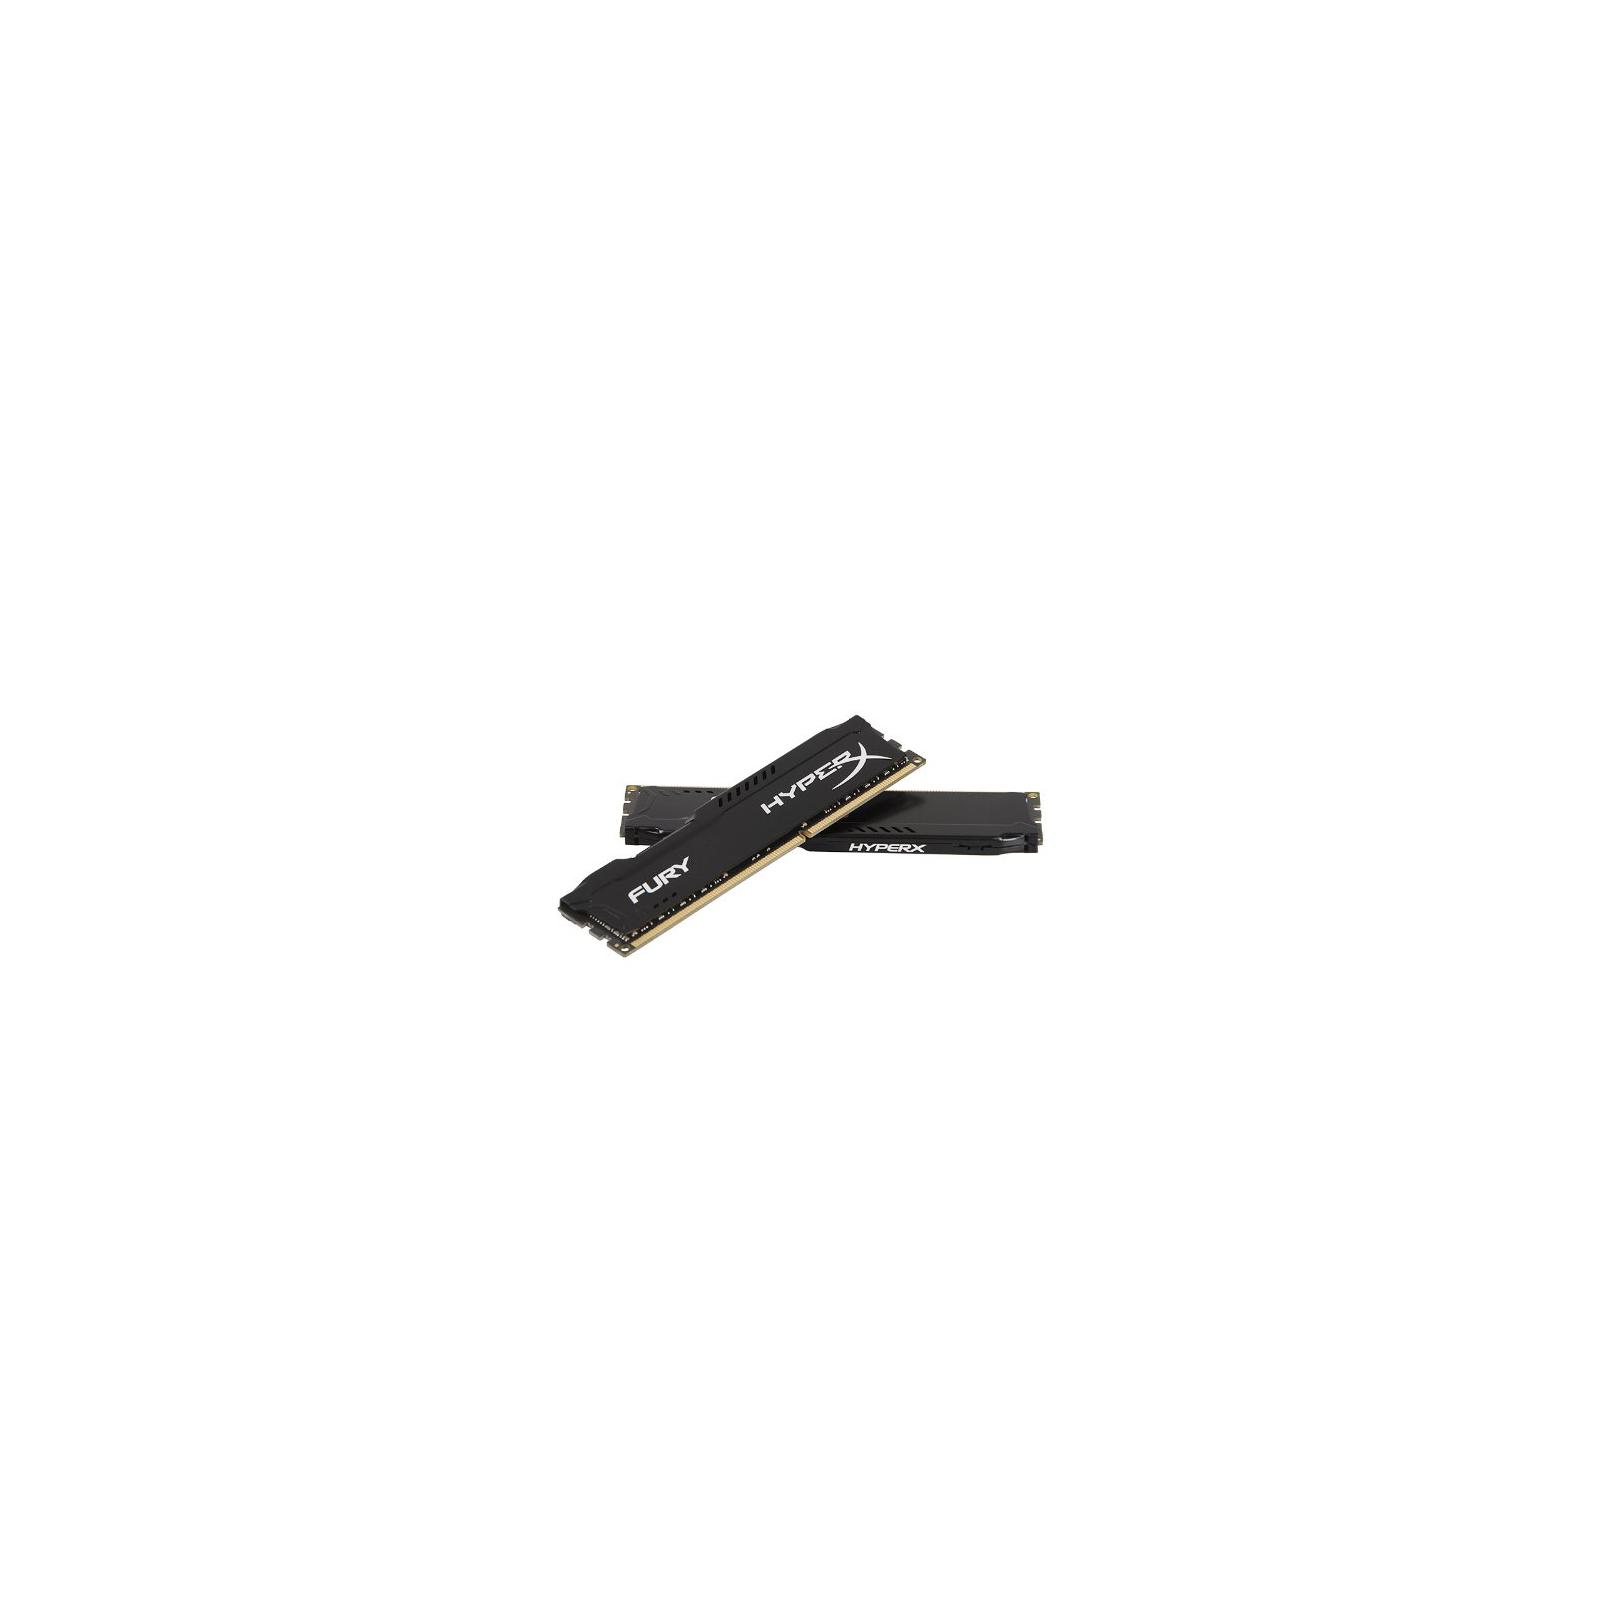 Модуль памяти для компьютера 16Gb DDR3 1600M Hz HyperX Fury Black (2x8GB) Kingston (HX316C10FBK2/16) изображение 4